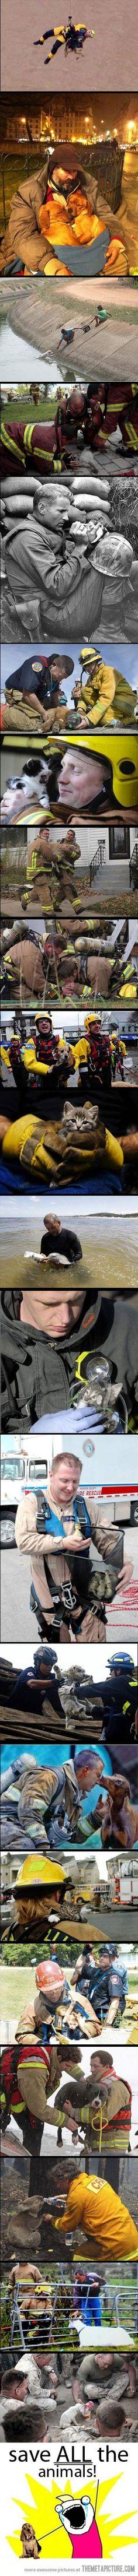 Saving animals.